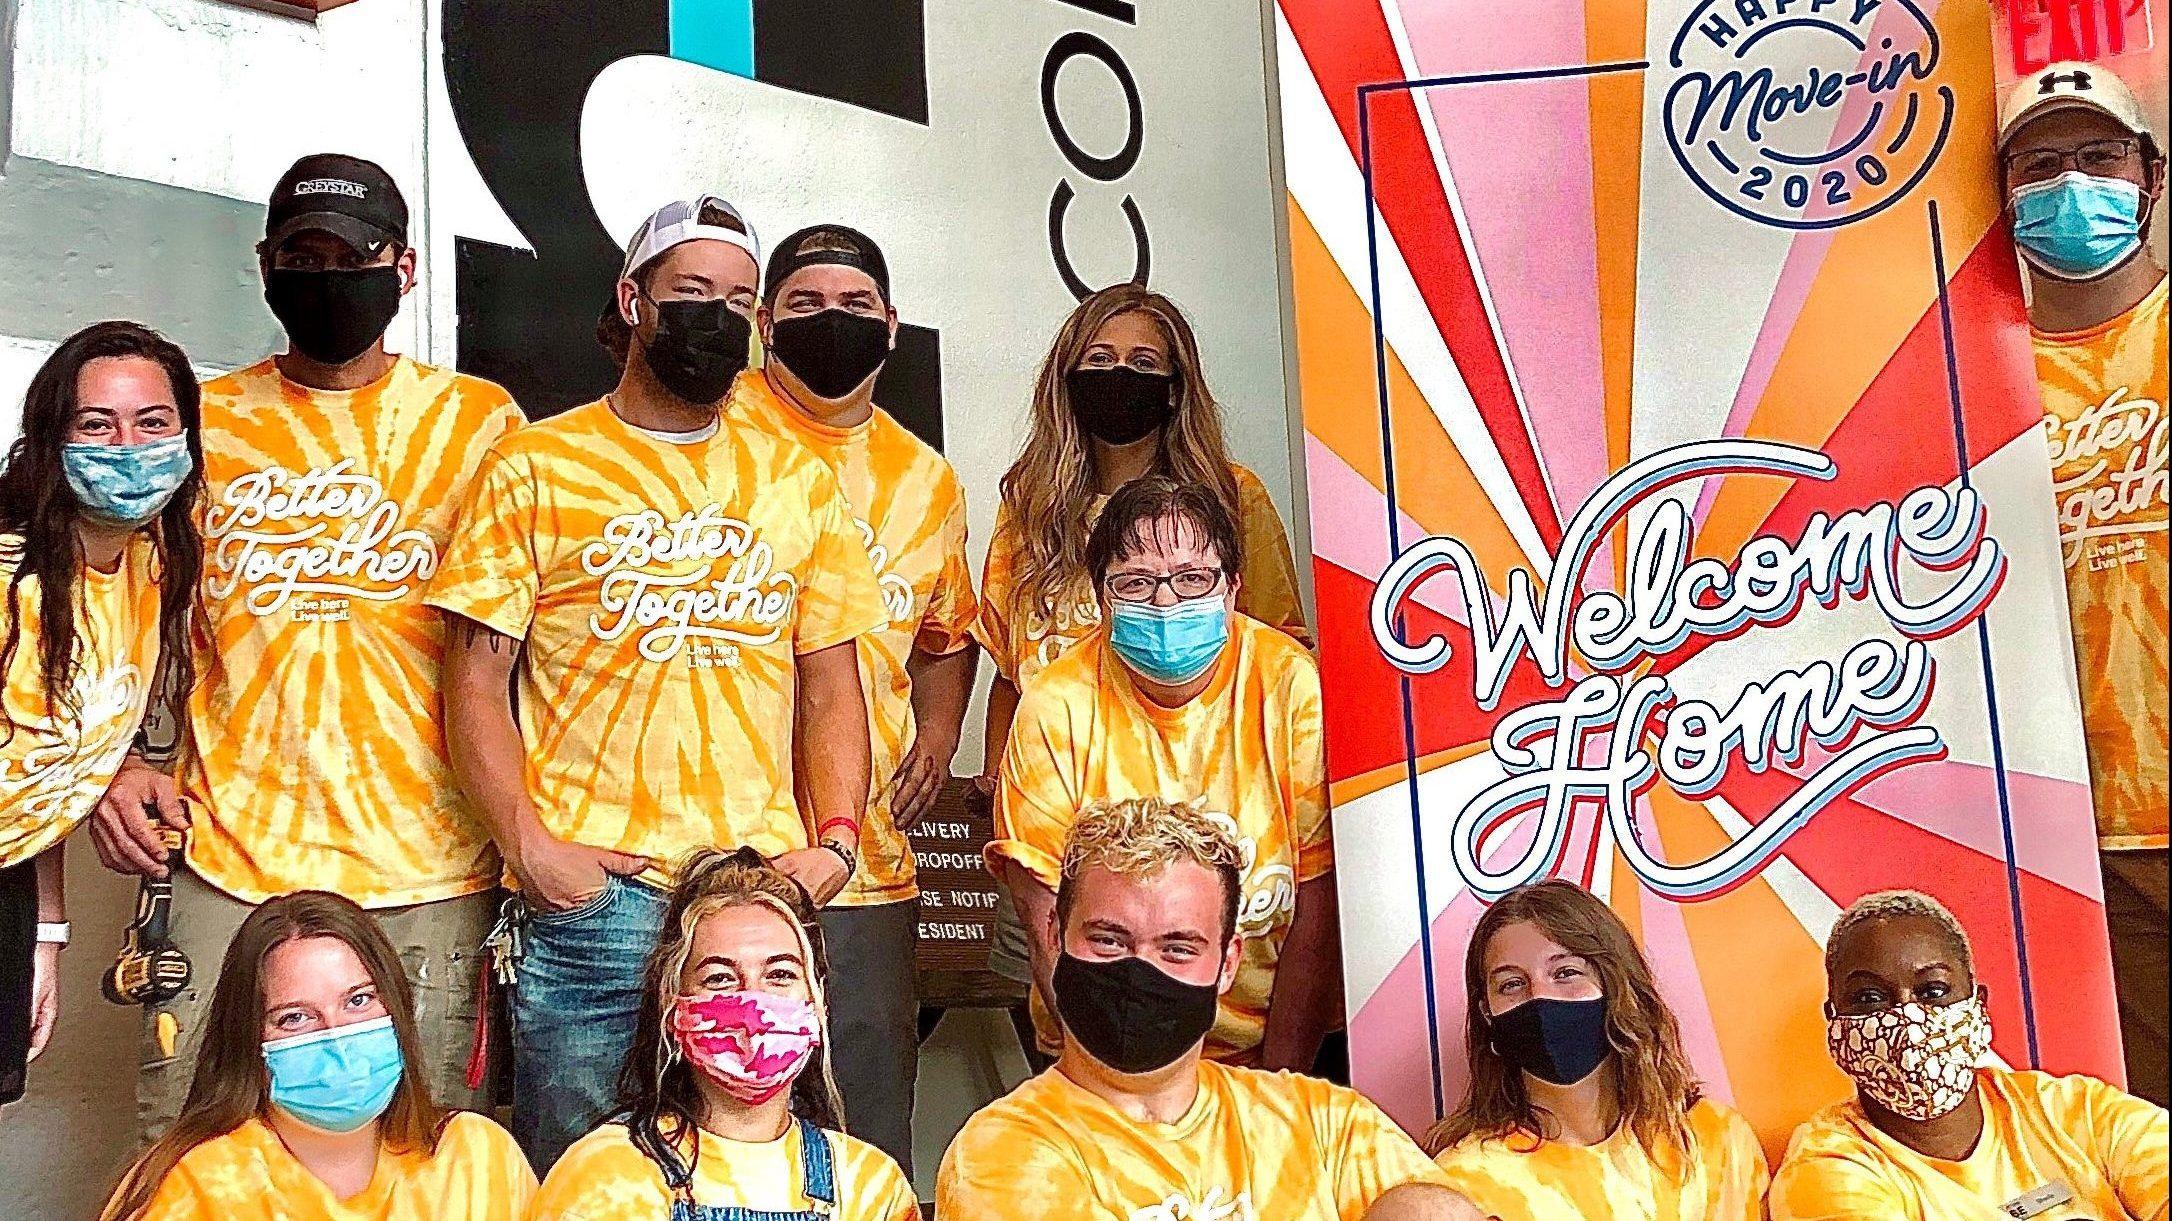 Dakota Trenkamp and fellow interns with face coverings